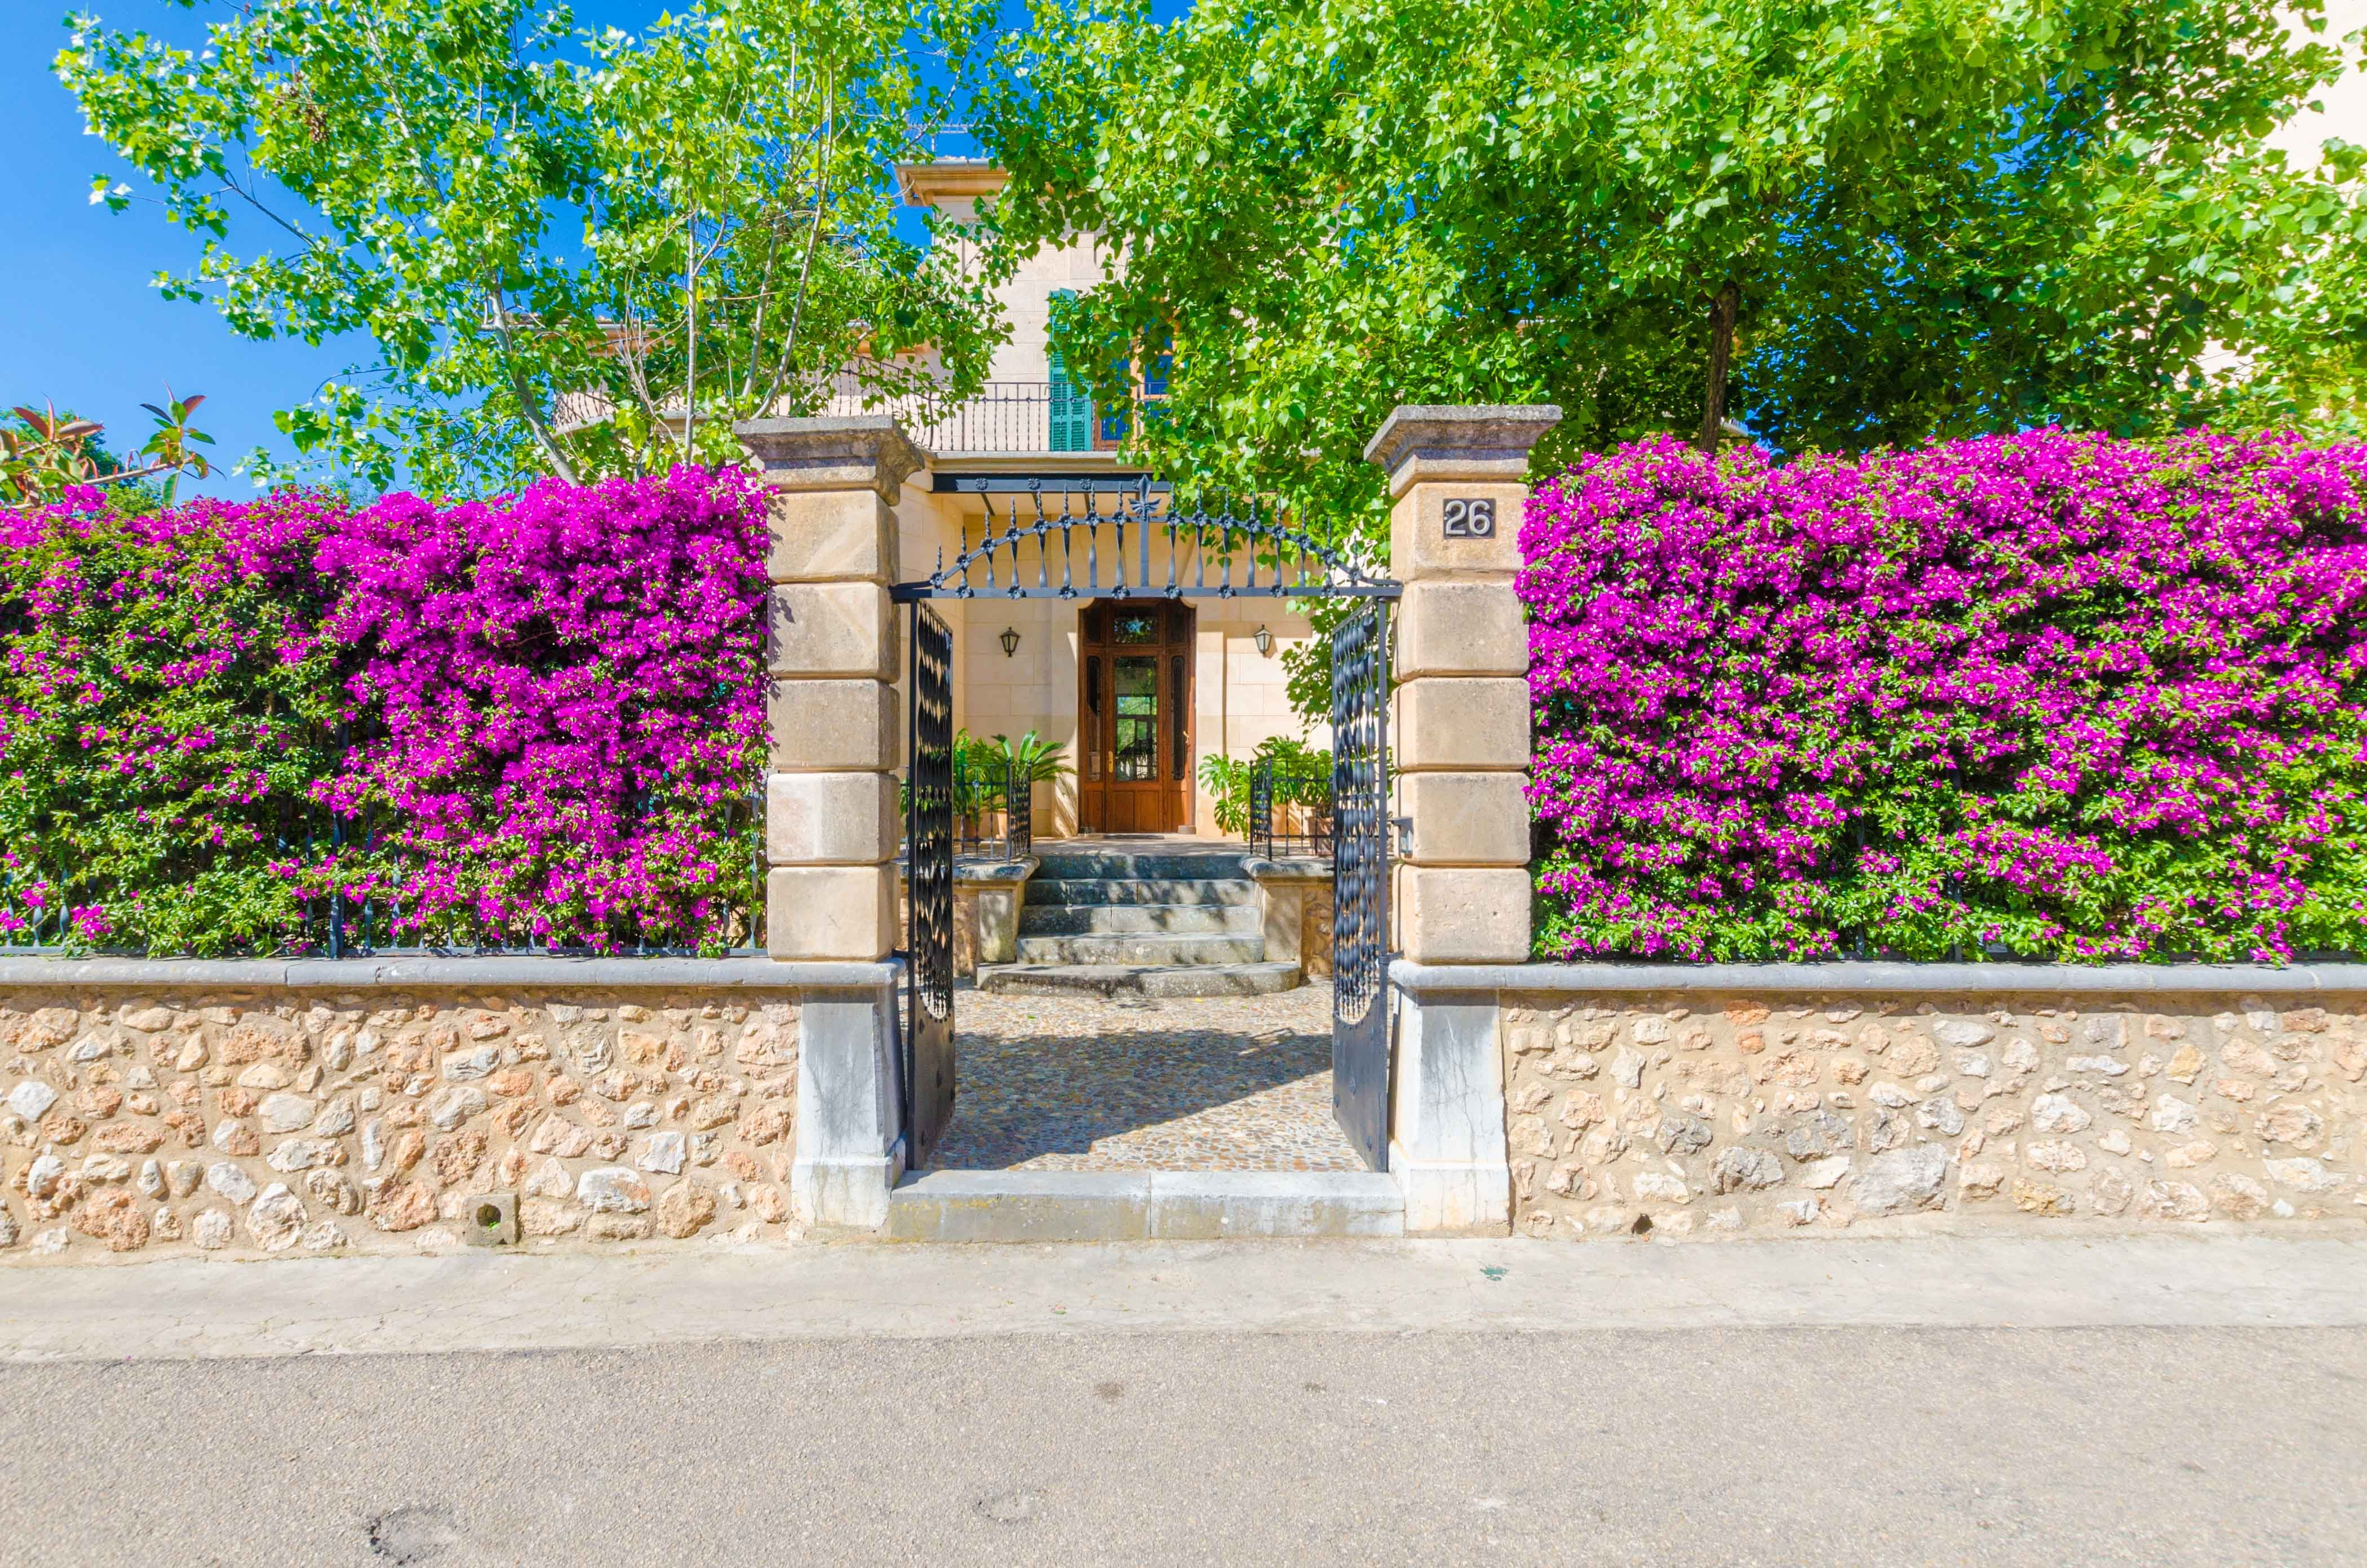 Maison de vacances CAS CONVIDATS (2435013), Alaro, Majorque, Iles Baléares, Espagne, image 76